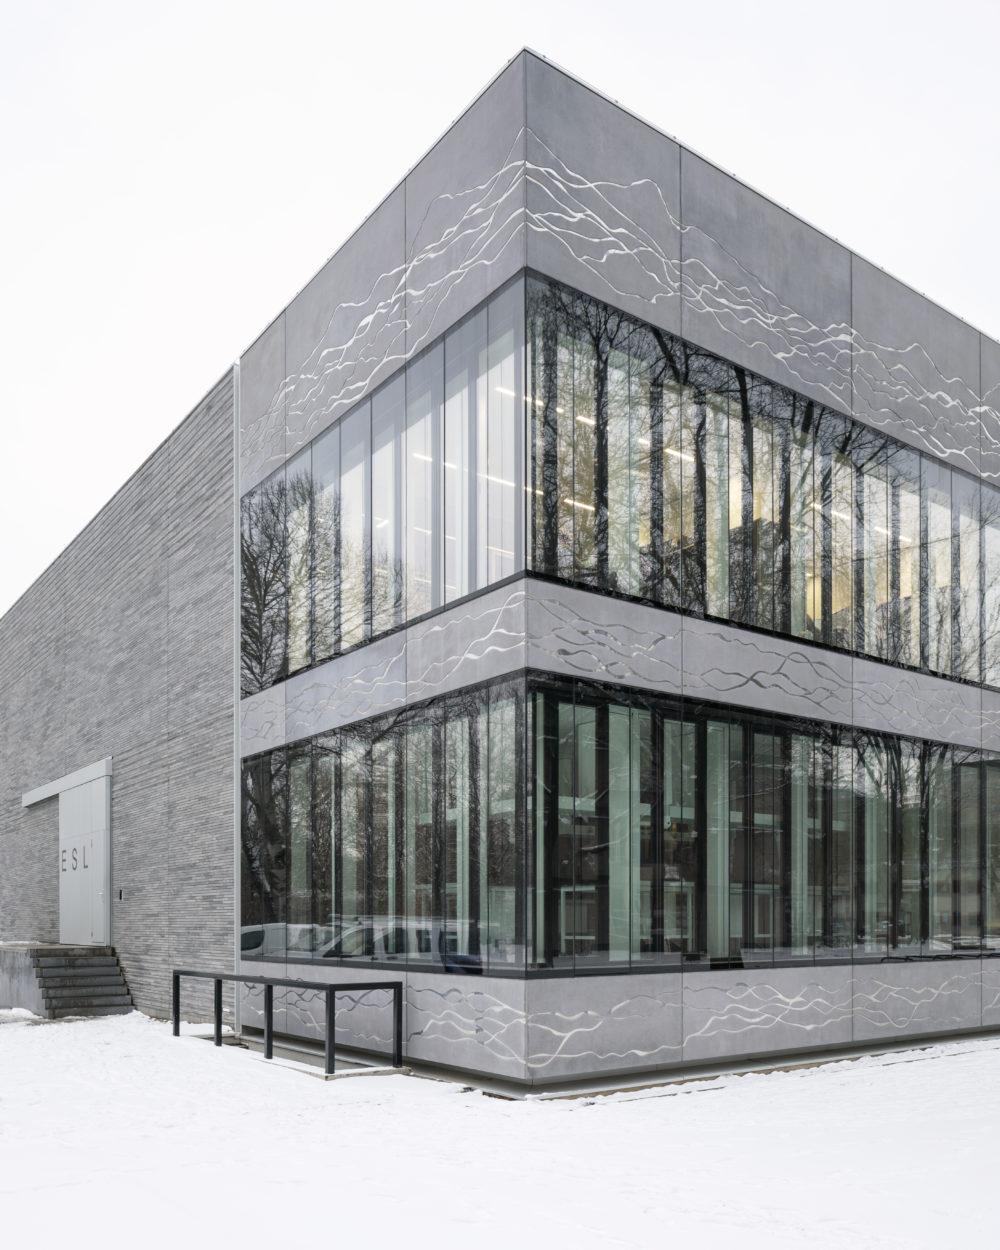 ARC19: Earth Simulation Laboratory – Barcode Architects i.s.m. ABT